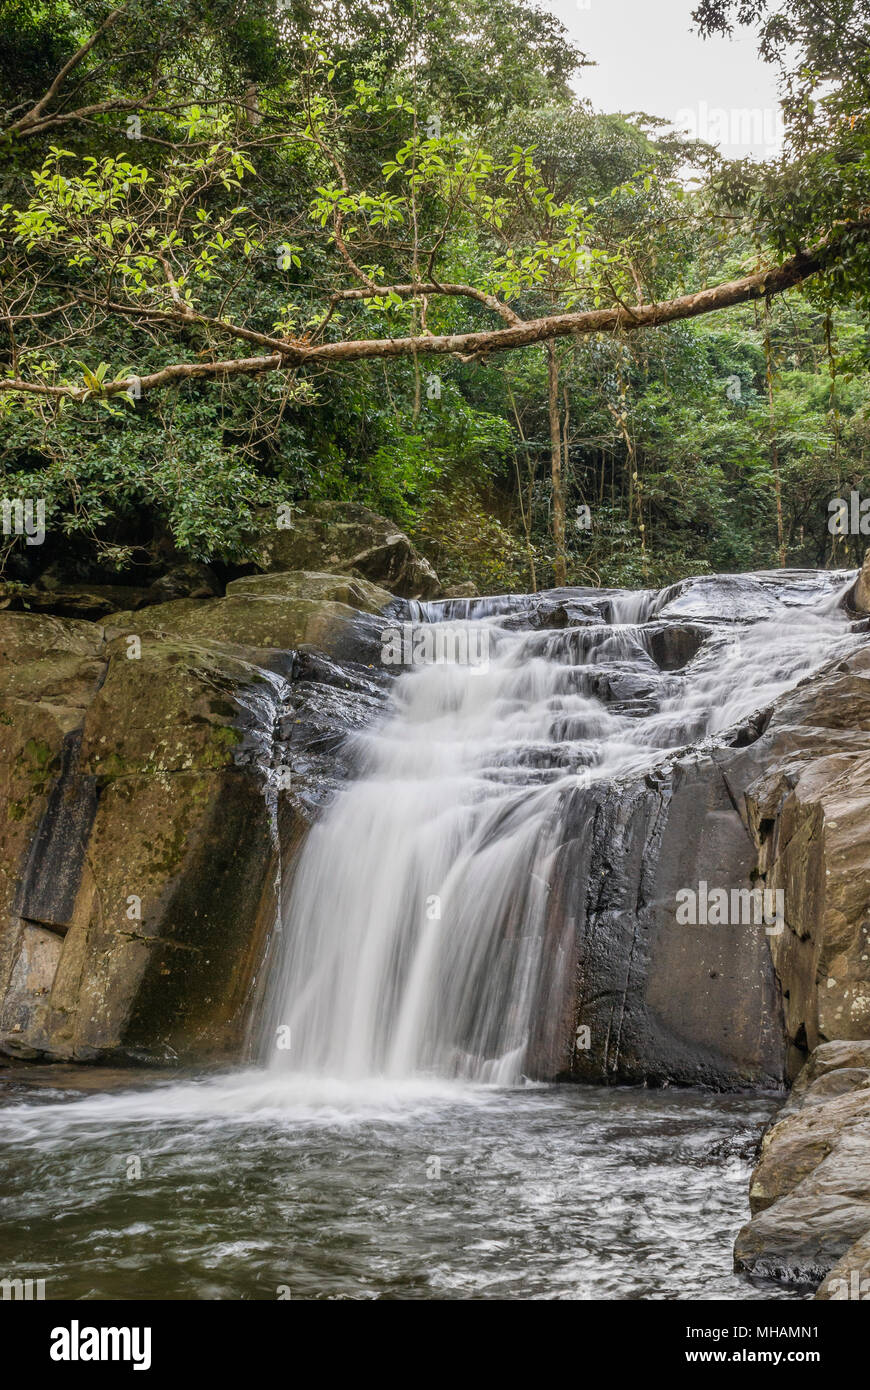 Pala-U Waterfall, Kaeng Krachan National Park, Thailand | Pala-U Wasserfall, Kaeng Krachan Nationalpark, Thailand Stock Photo